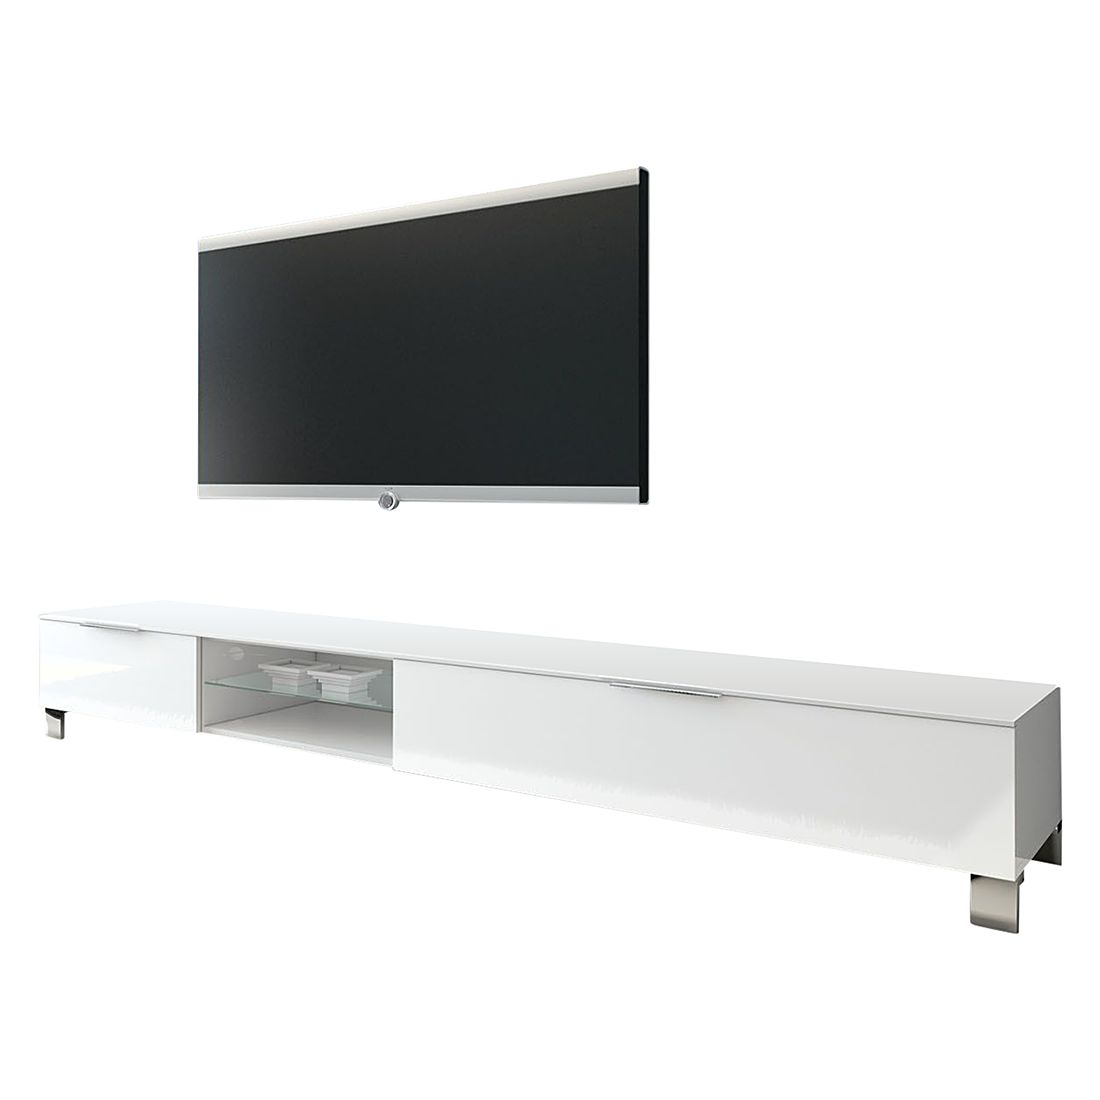 Tv-lowboard Margherita III hoogglans wit 210cm, Lc Mobili